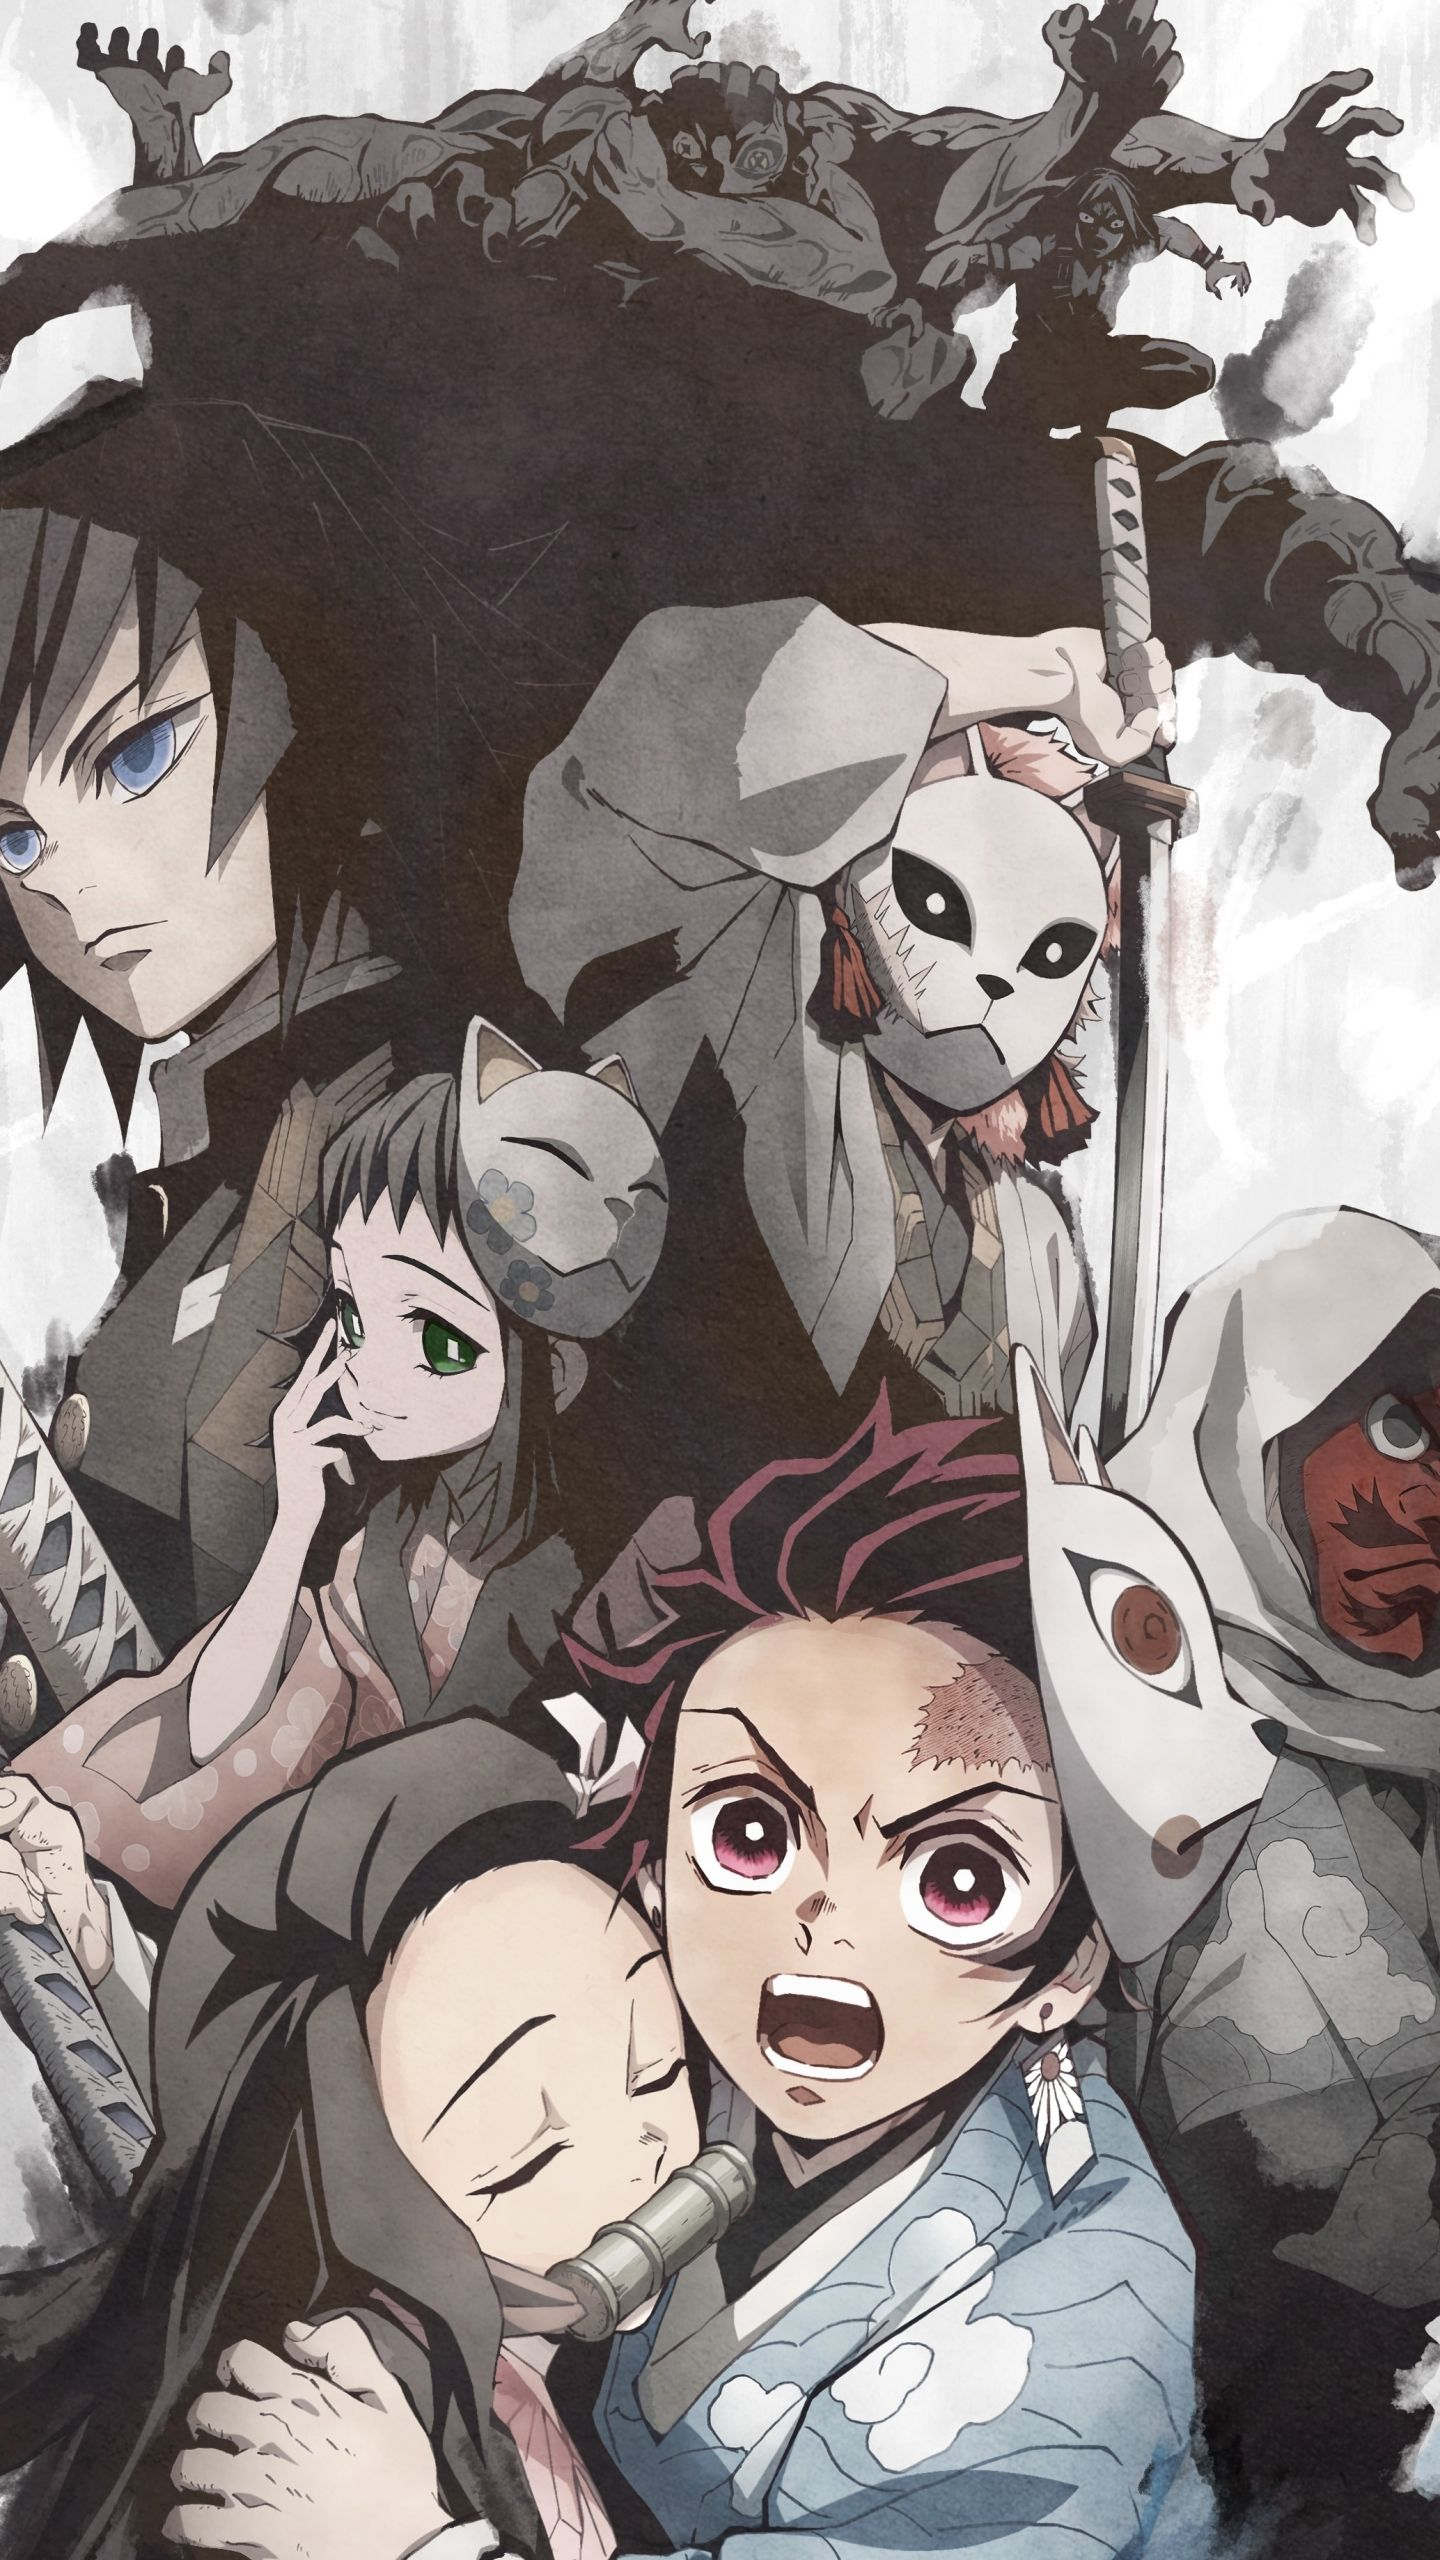 Demon Slayer Wallpaper Neon - Anime Wallpaper HD